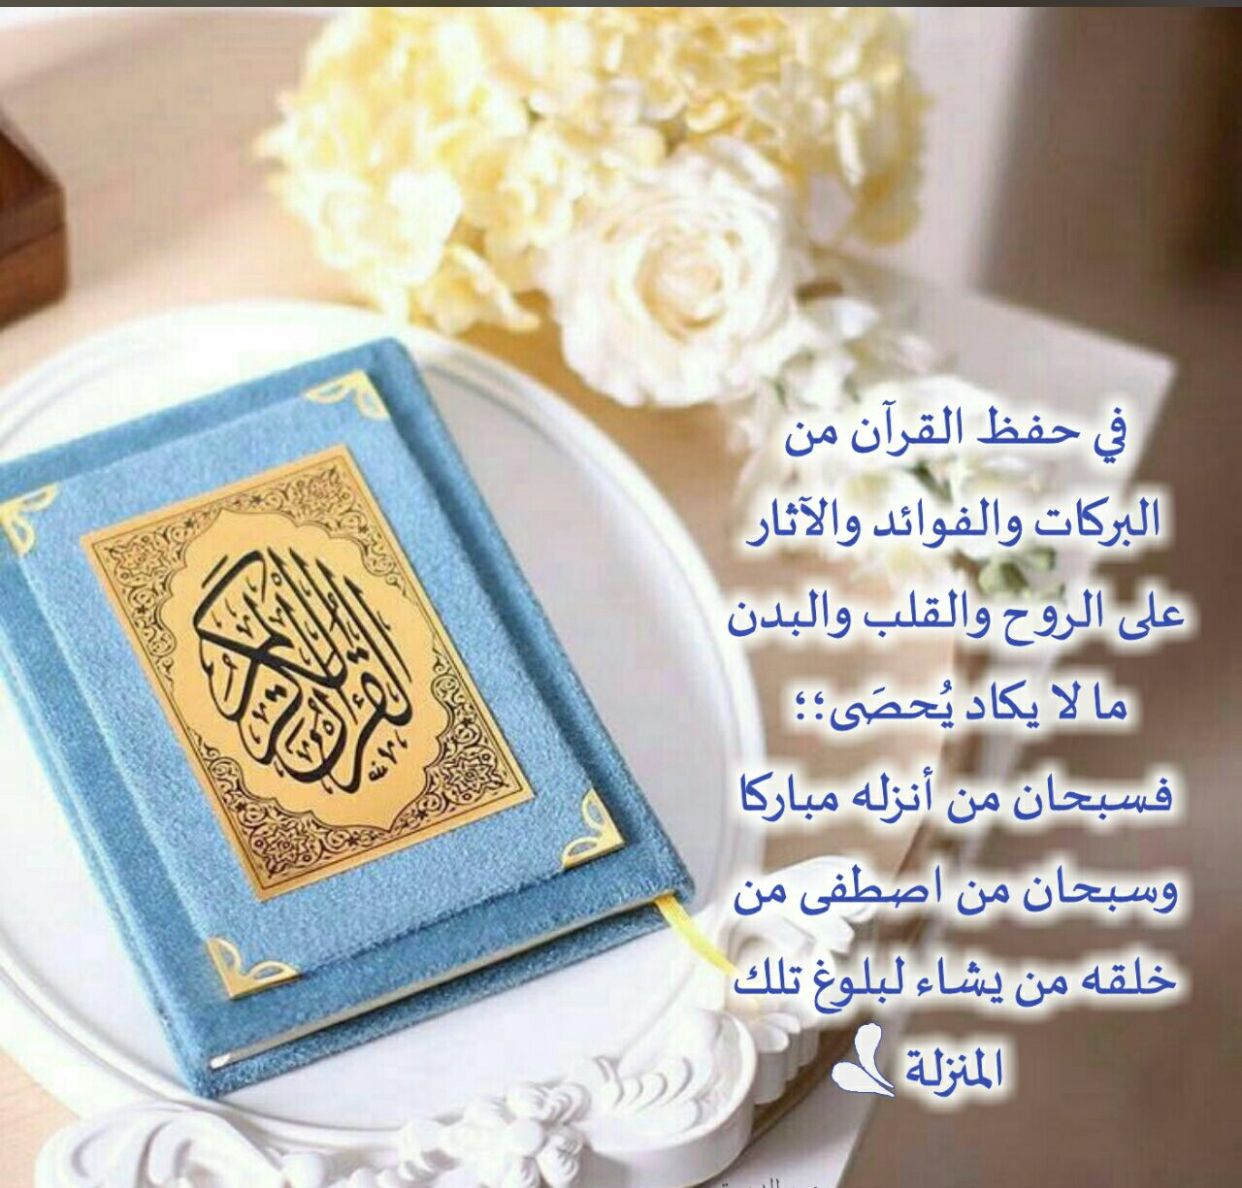 Pin By نور الإسلام On قراني Holy Quran Islam Quran Quran